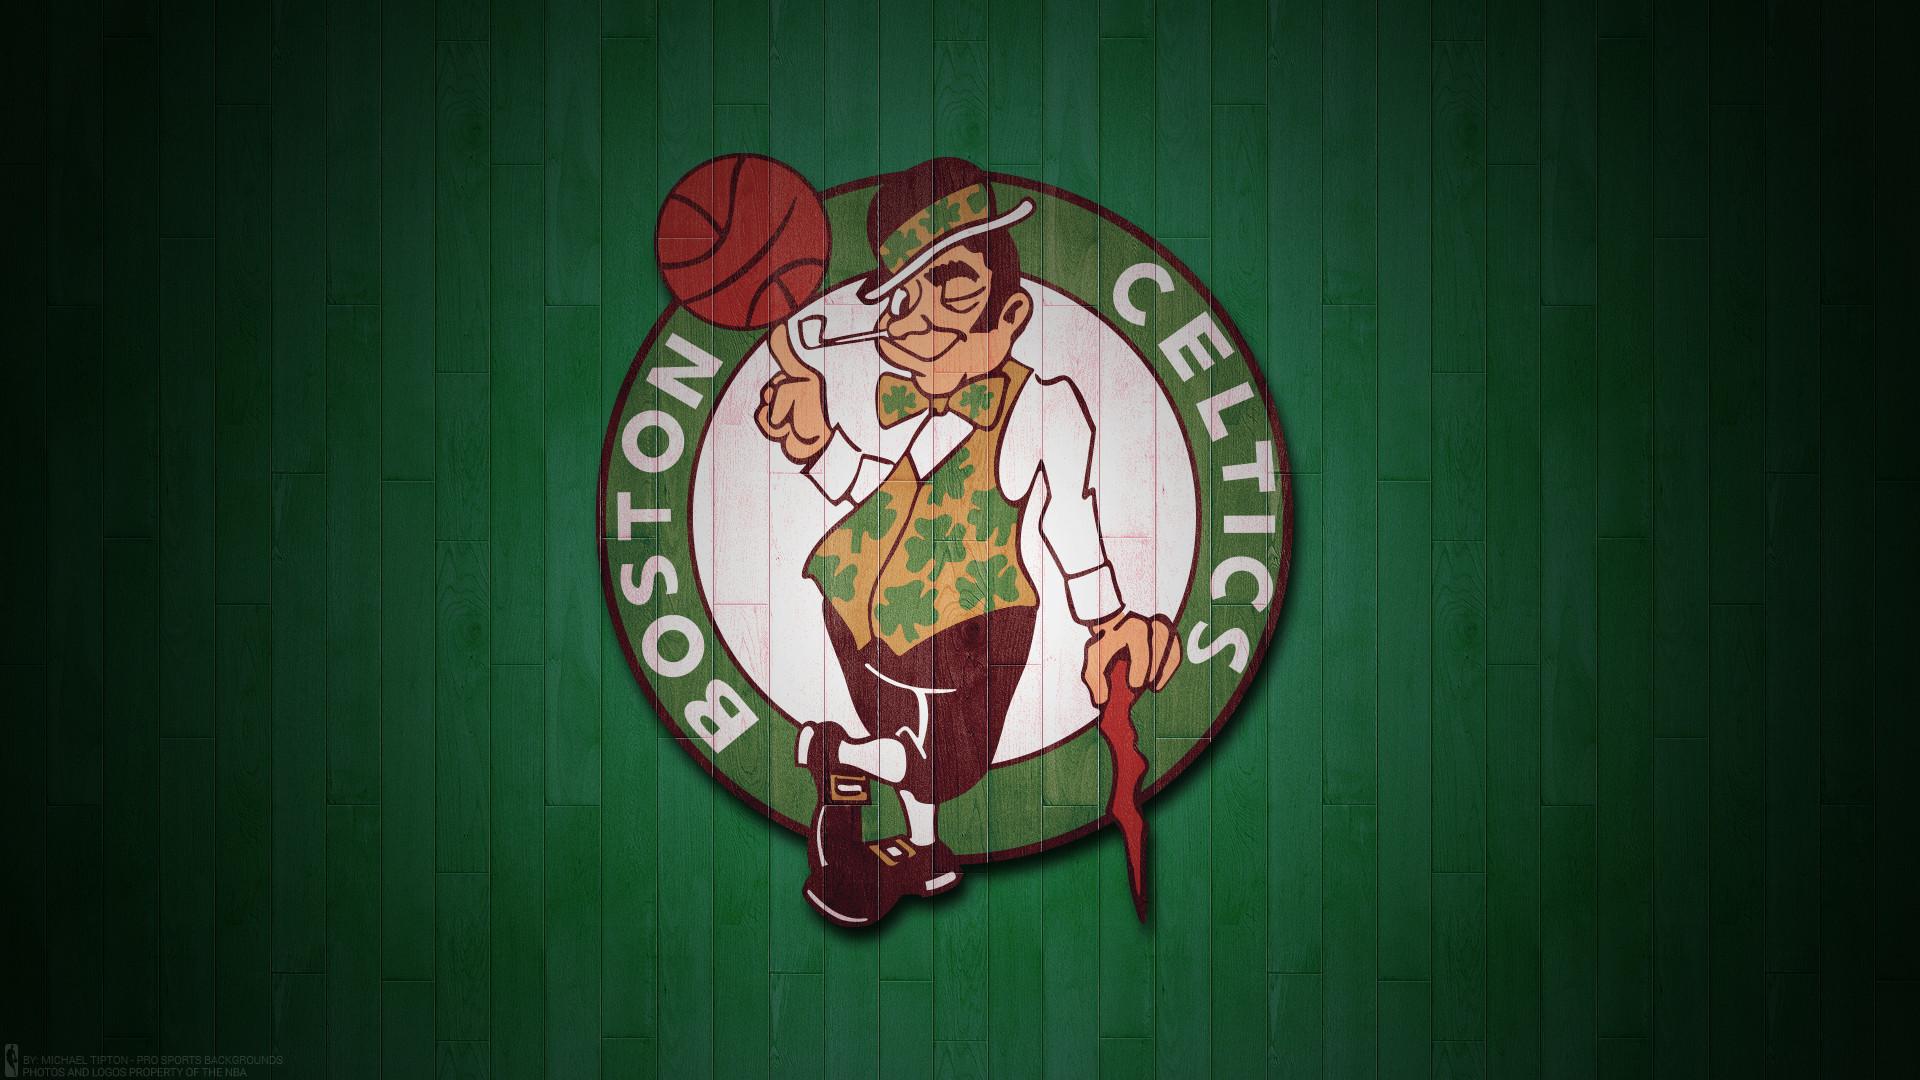 Res: 1920x1080, Boston Celtics 2017 nba basketball team logo hardwood wallpaper free for  mac and desktop pc computer